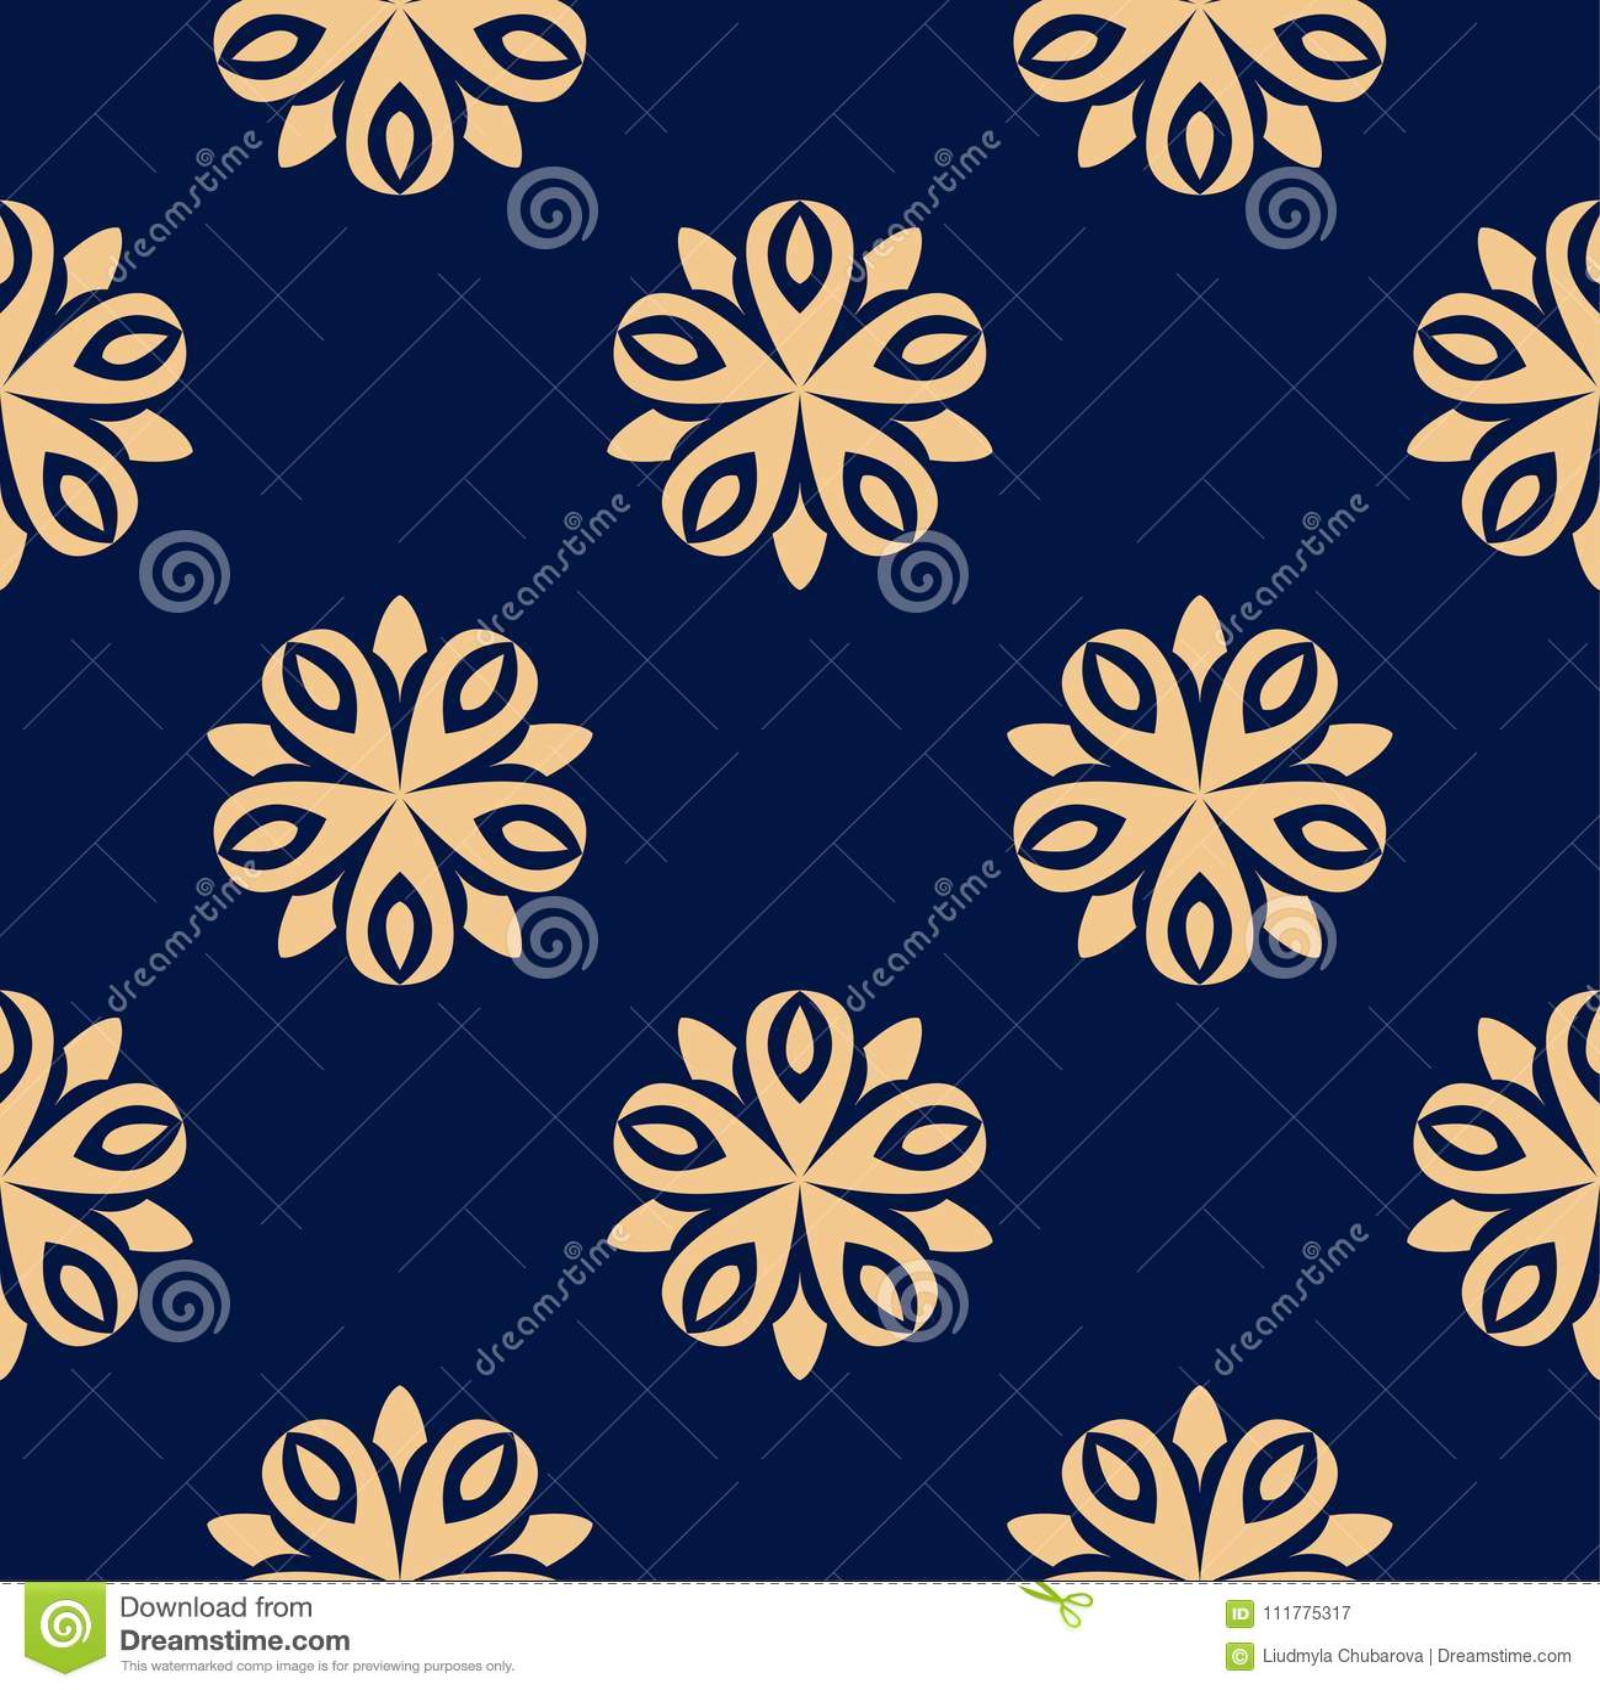 Golden floral seamless pattern on blue background